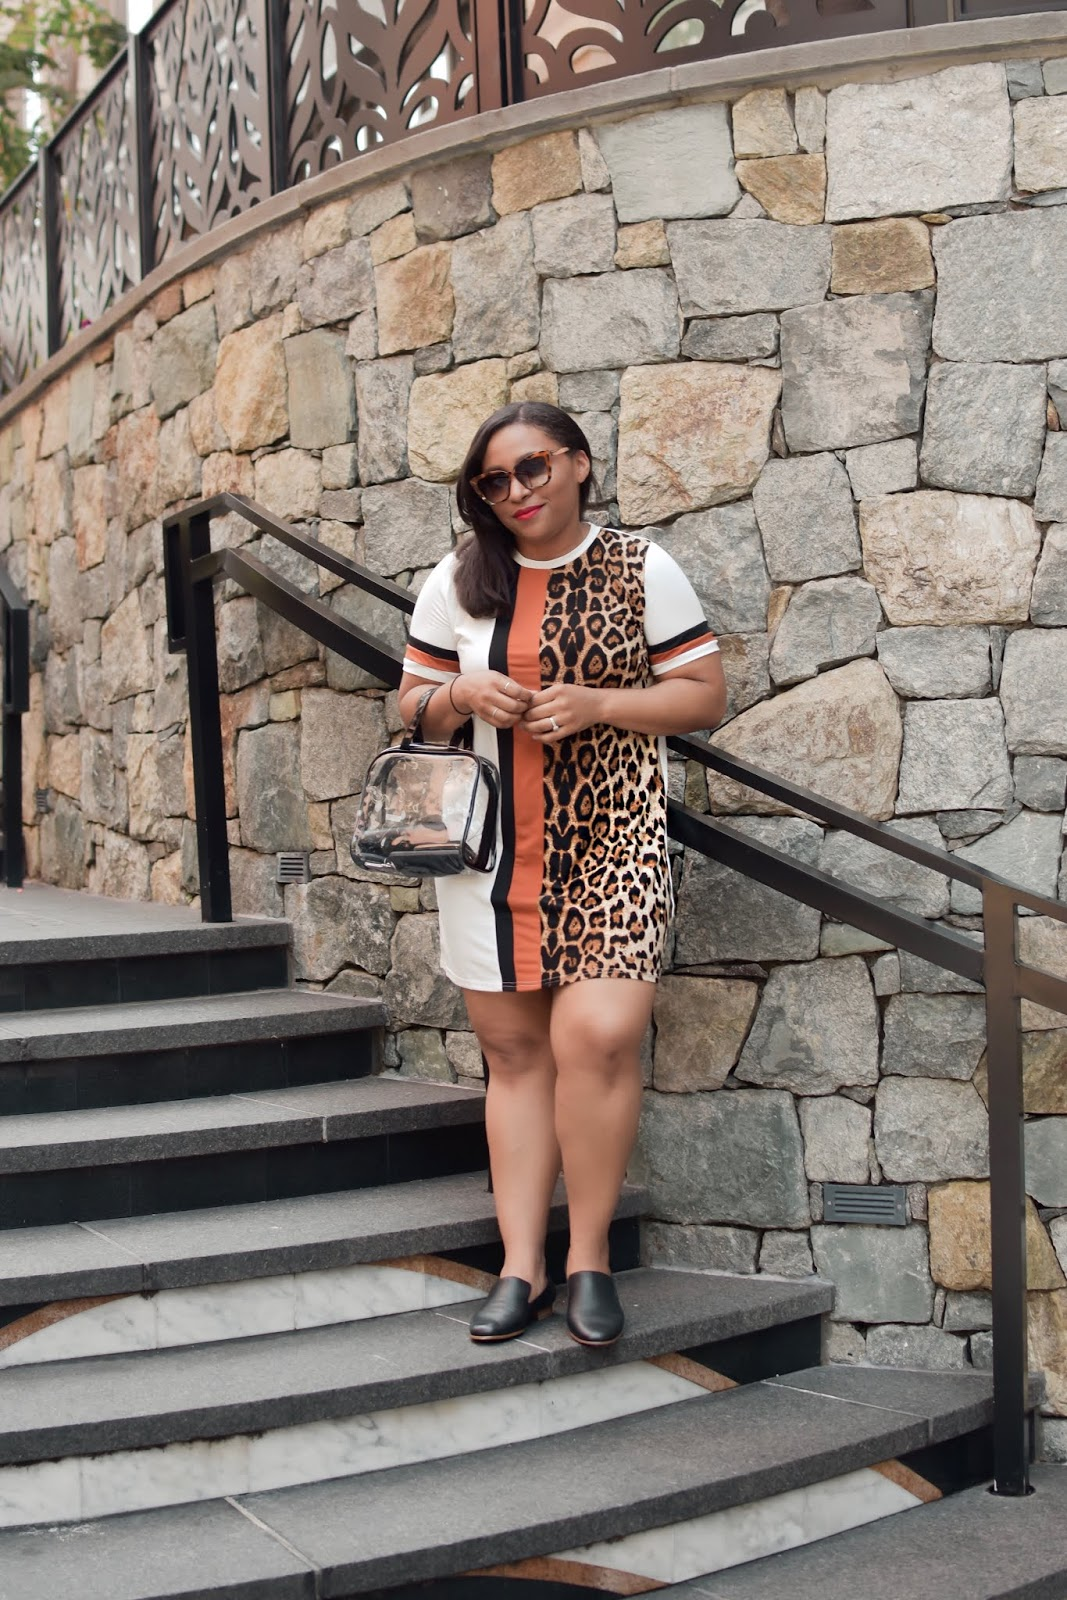 shein, shein gals, shein clothes, shein reviews, leopard dress, summer dresses, shirt dress